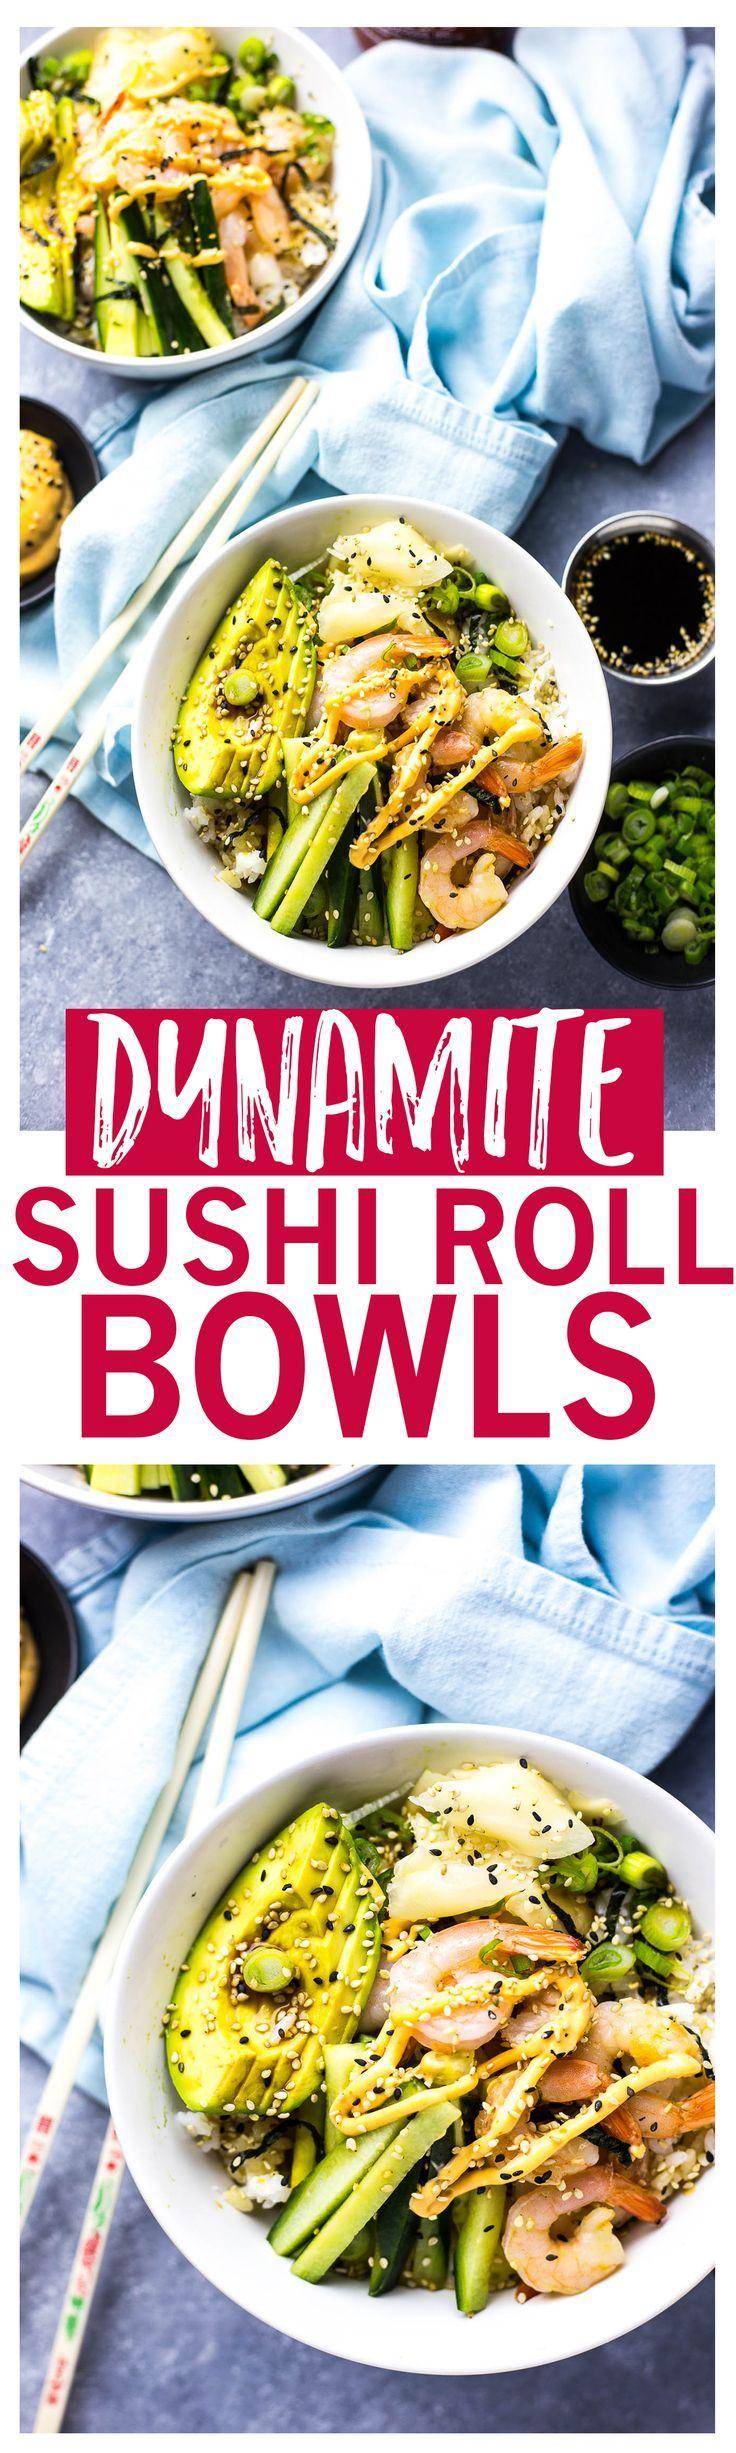 Shrimp Dynamite Sushi Bowls   Healthy 20-minute grain bowl   Gluten free